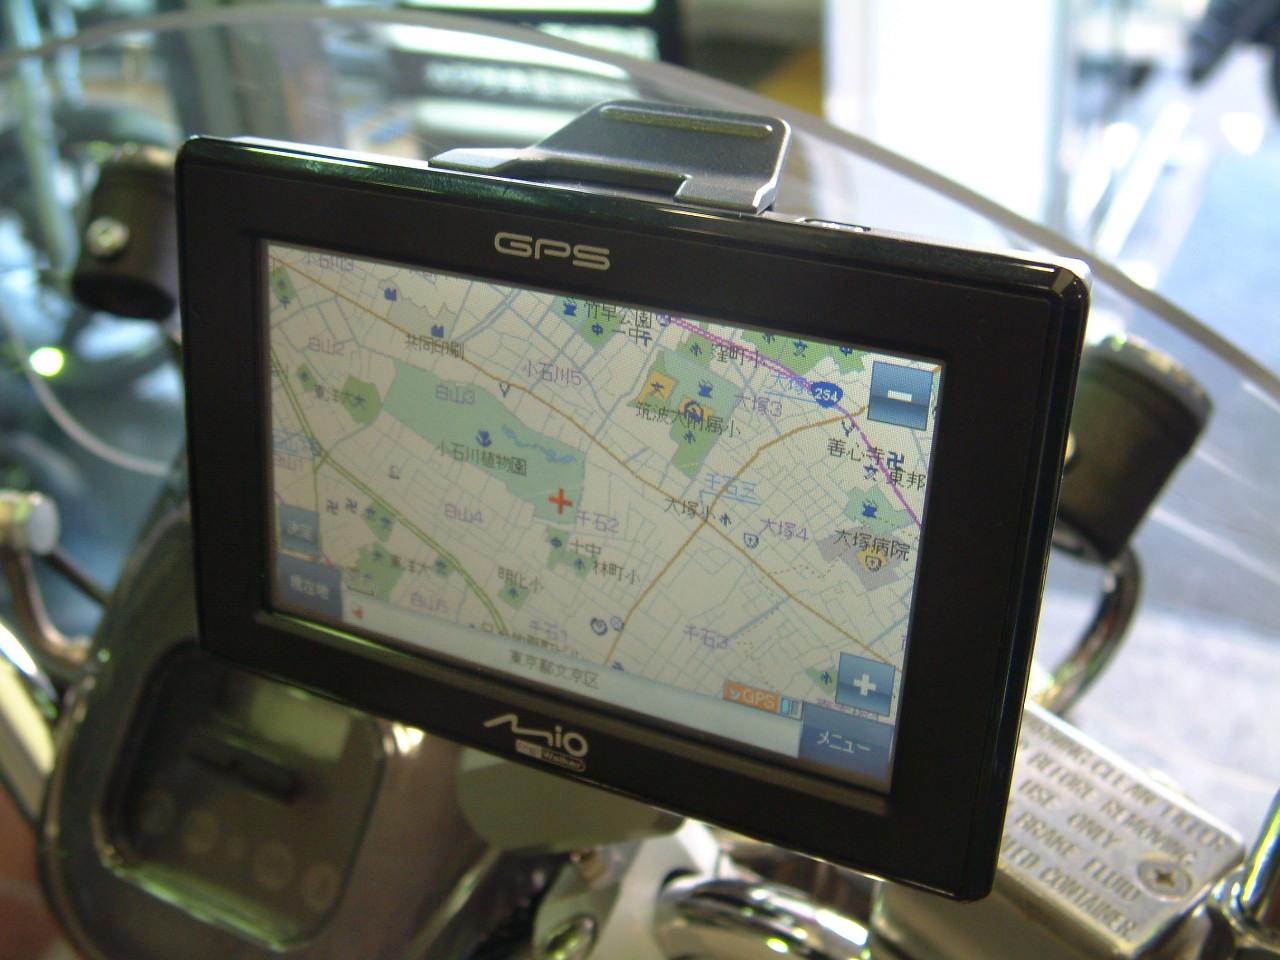 GPS ナビ Mio C323 登場_d0099181_14304815.jpg